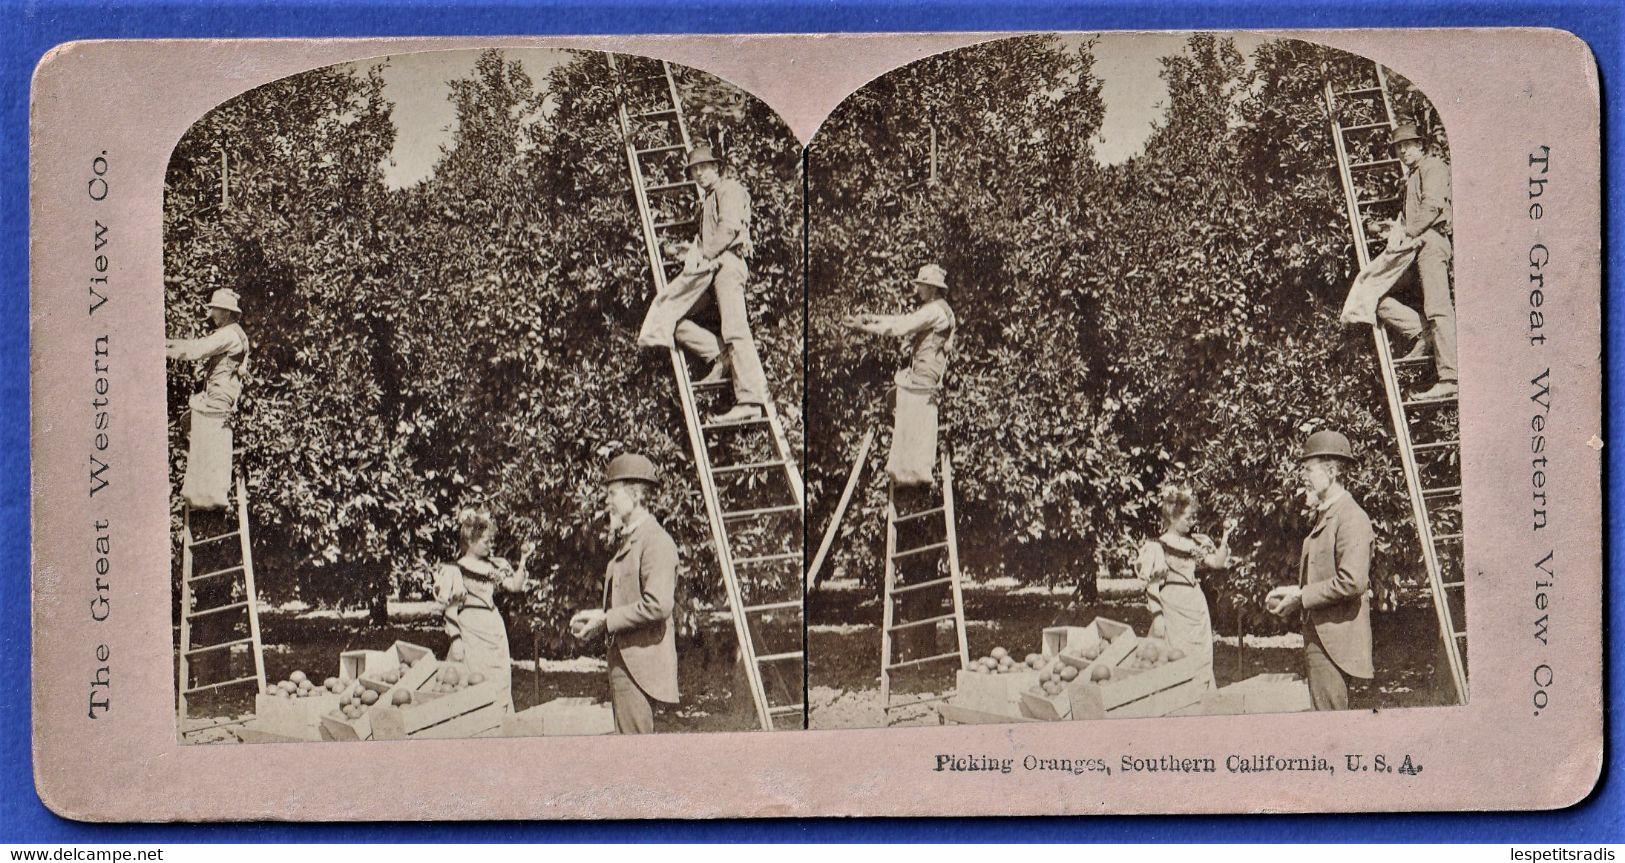 PHOTO STEREOSCOPIQUE, STEREOVIEW - Picking Oranges, Southern California, U.S.A. / Californie, Etats-unis - Photos Stéréoscopiques